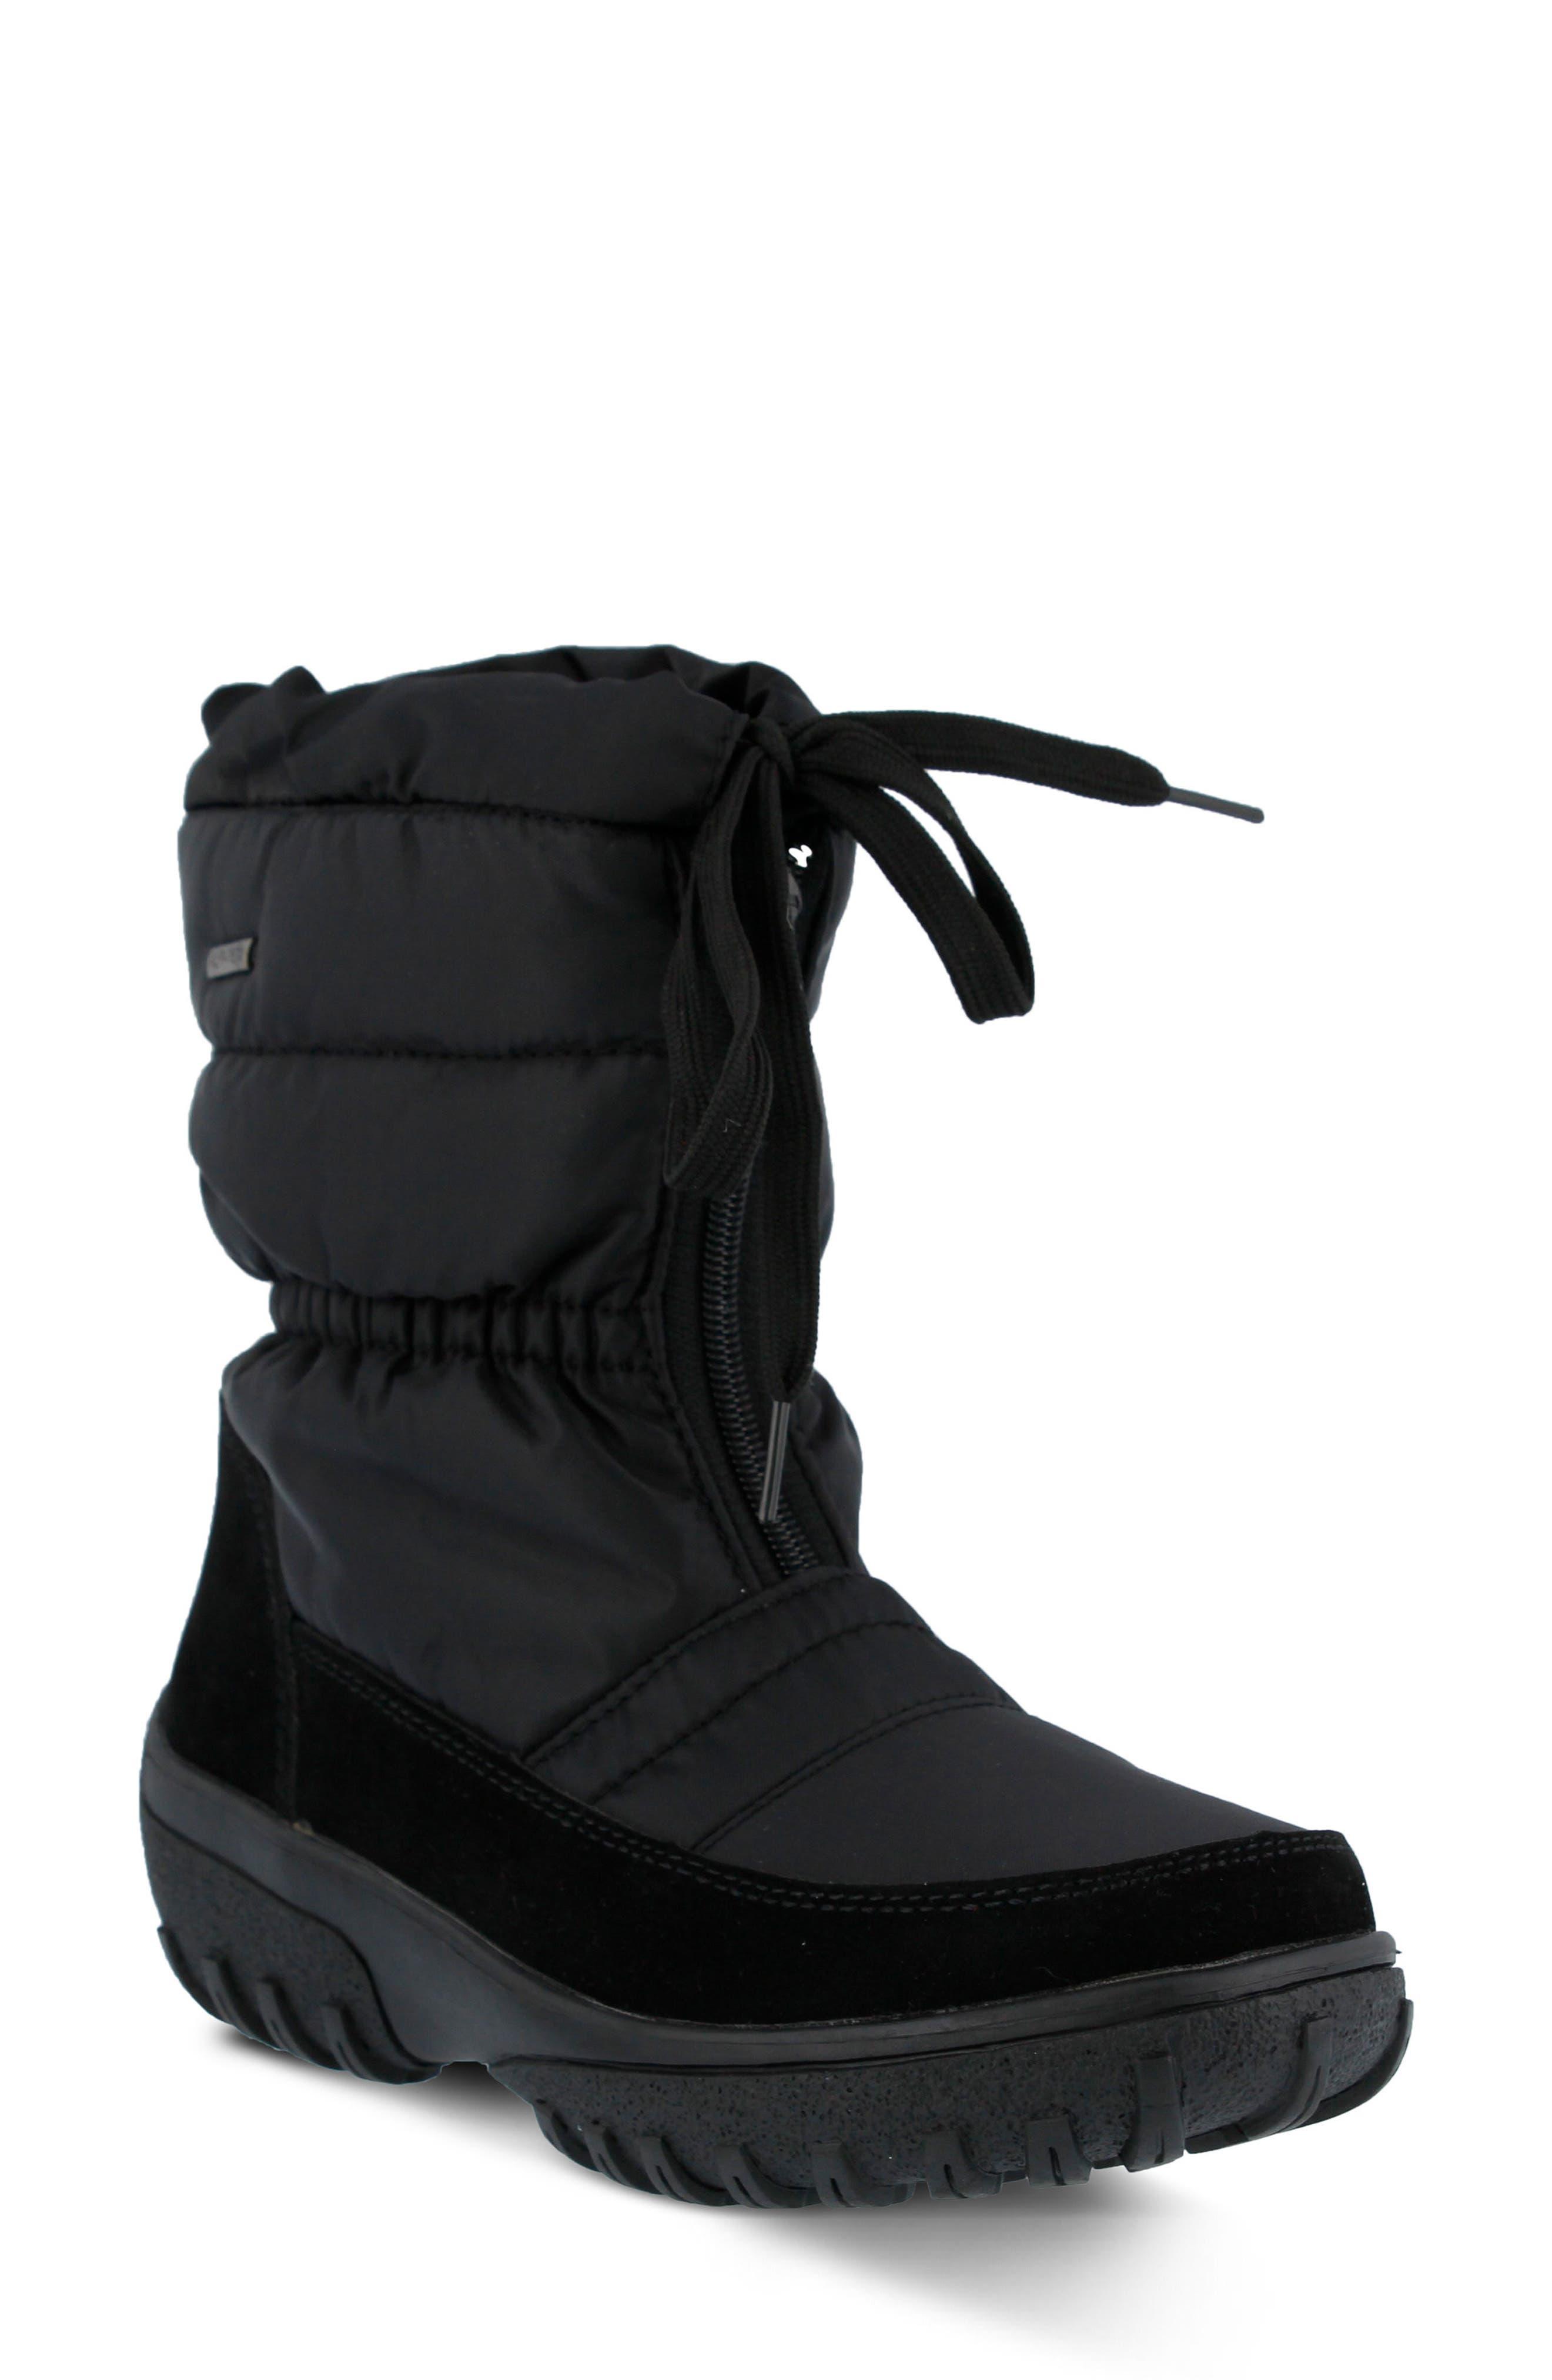 Lucerne Waterproof Drawstring Boot,                         Main,                         color, Black